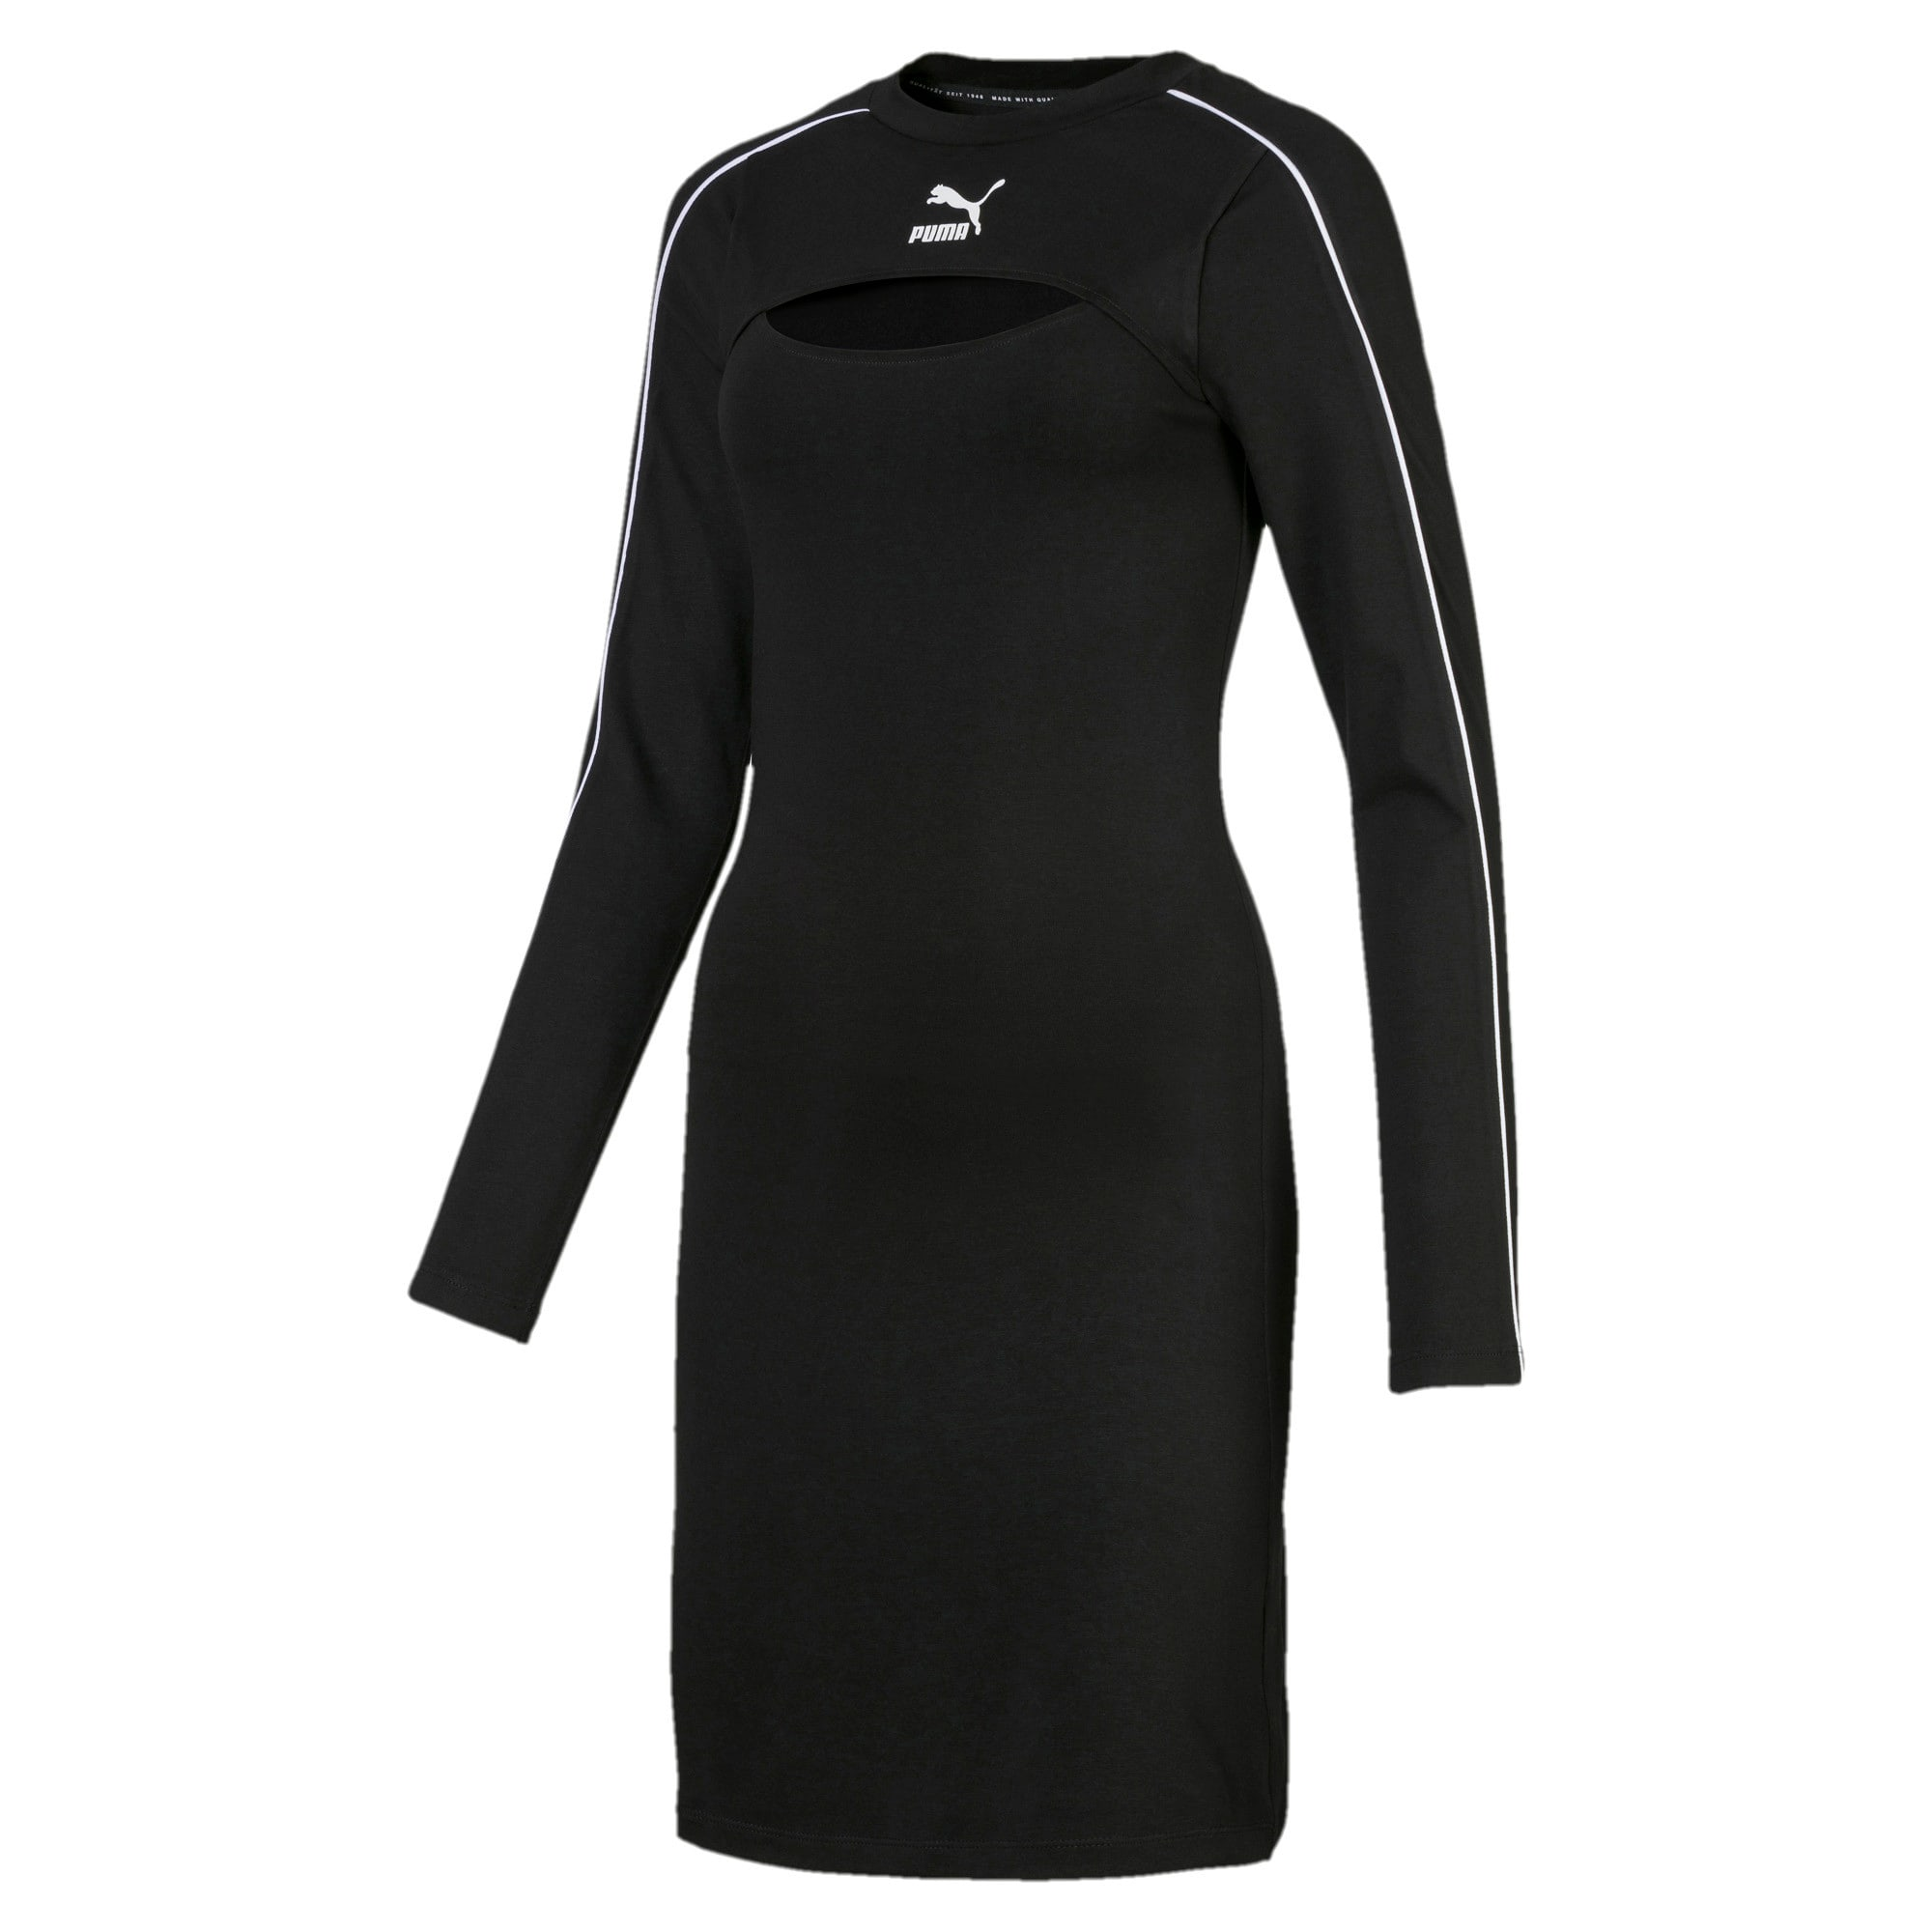 Thumbnail 4 of Classics Women's Dress, Puma Black, medium